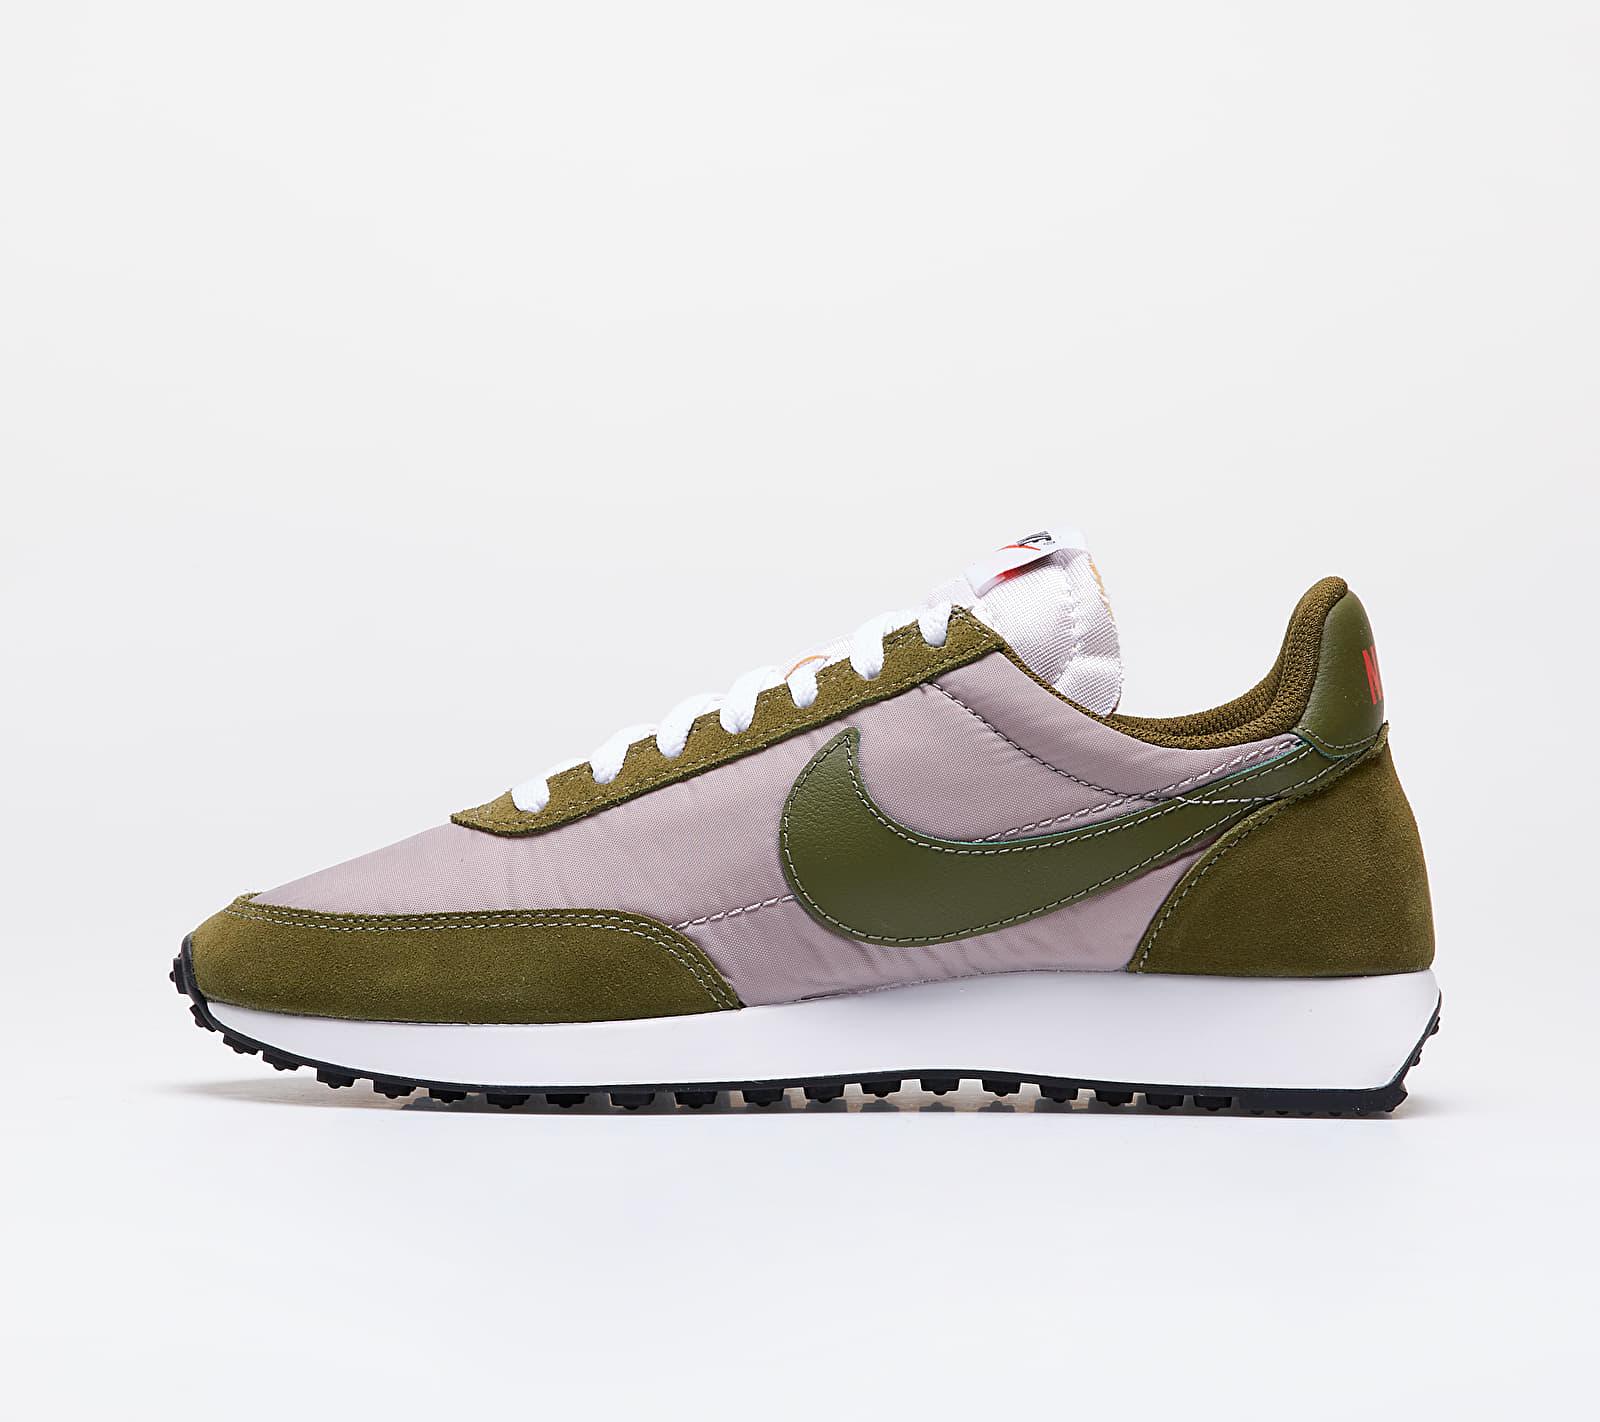 Nike Air Tailwind 79 Pumice/ Legion Green-White-Black 487754-204